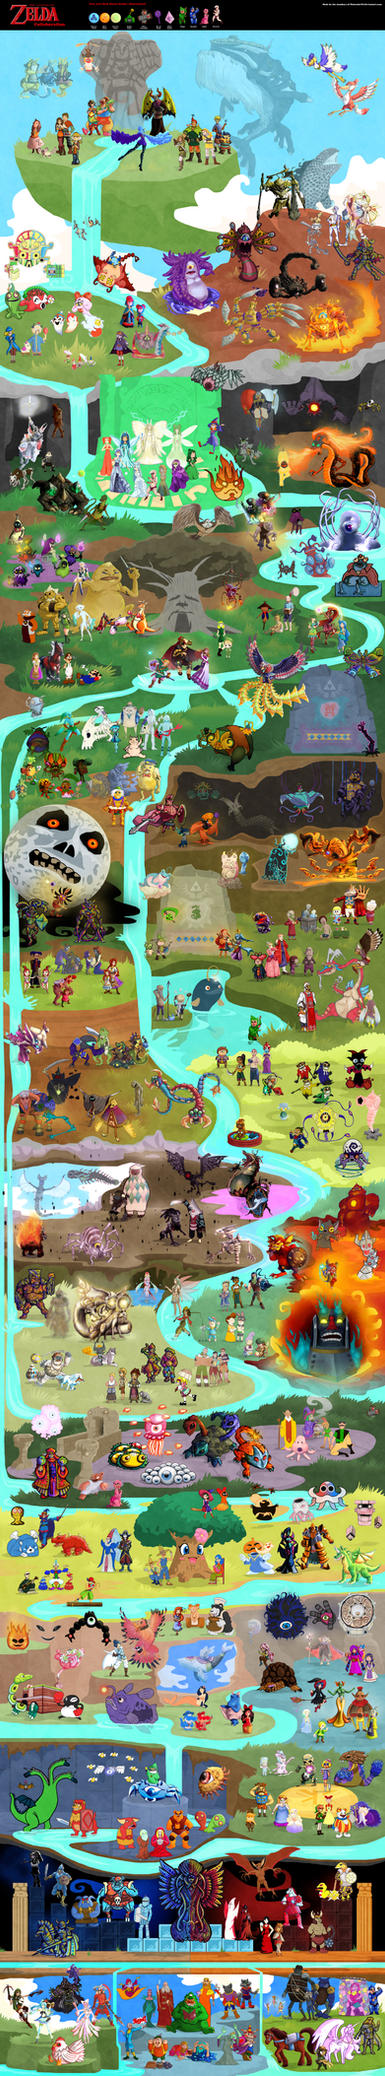 Massive Legend of Zelda Collaboration by DrZime